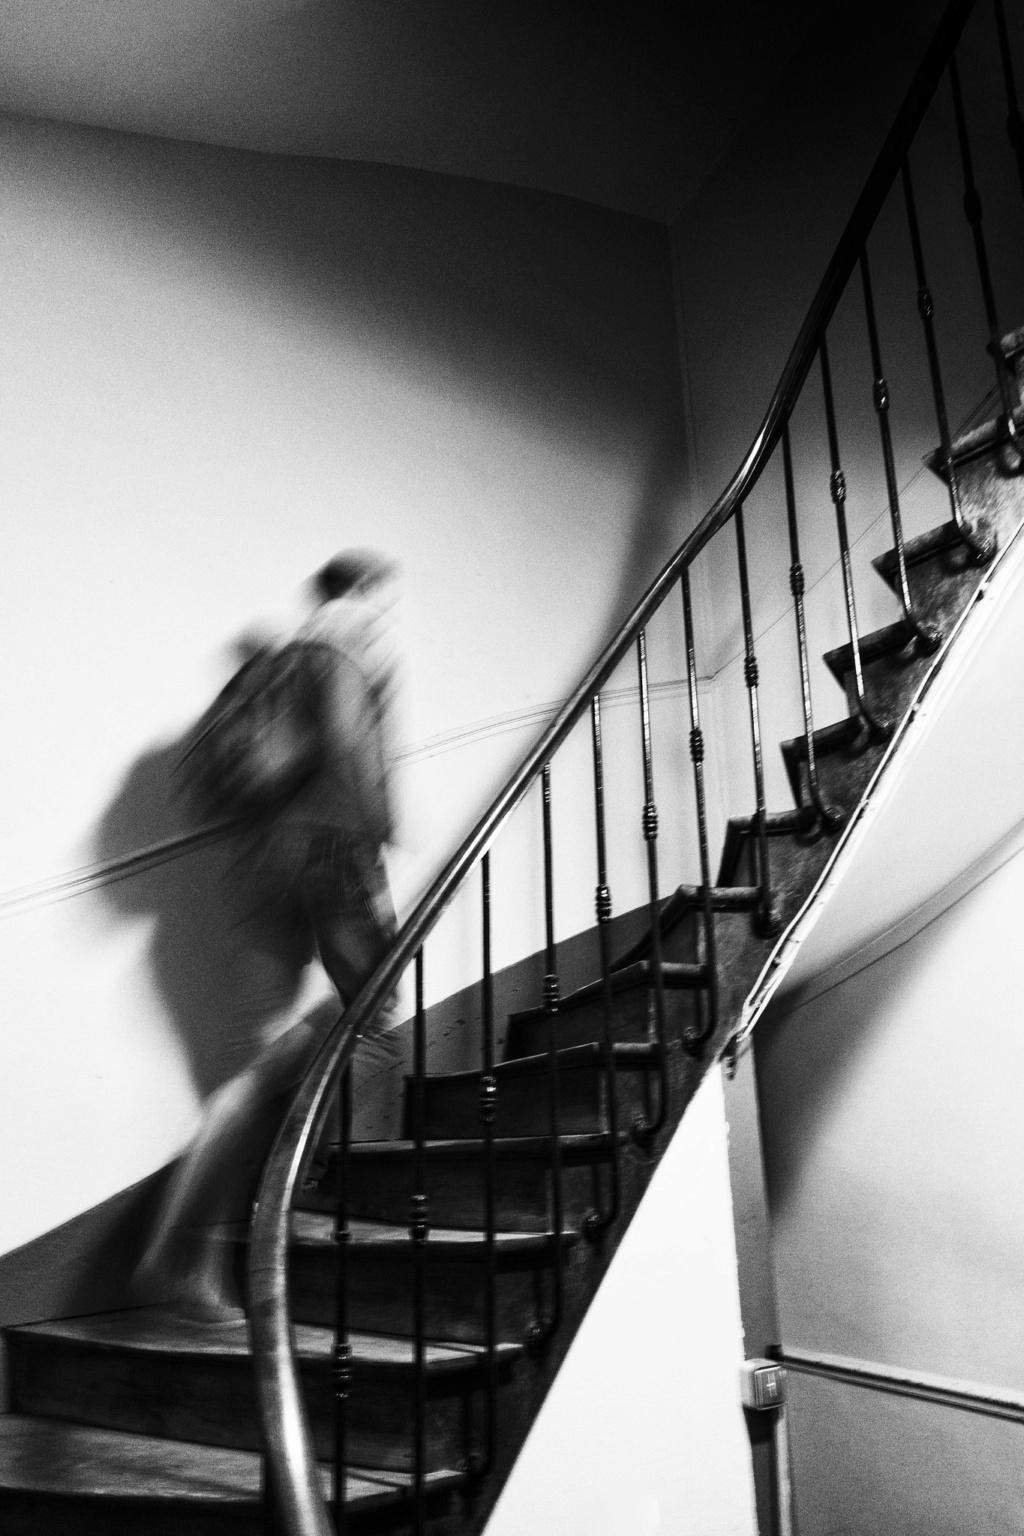 Stairway 48813910